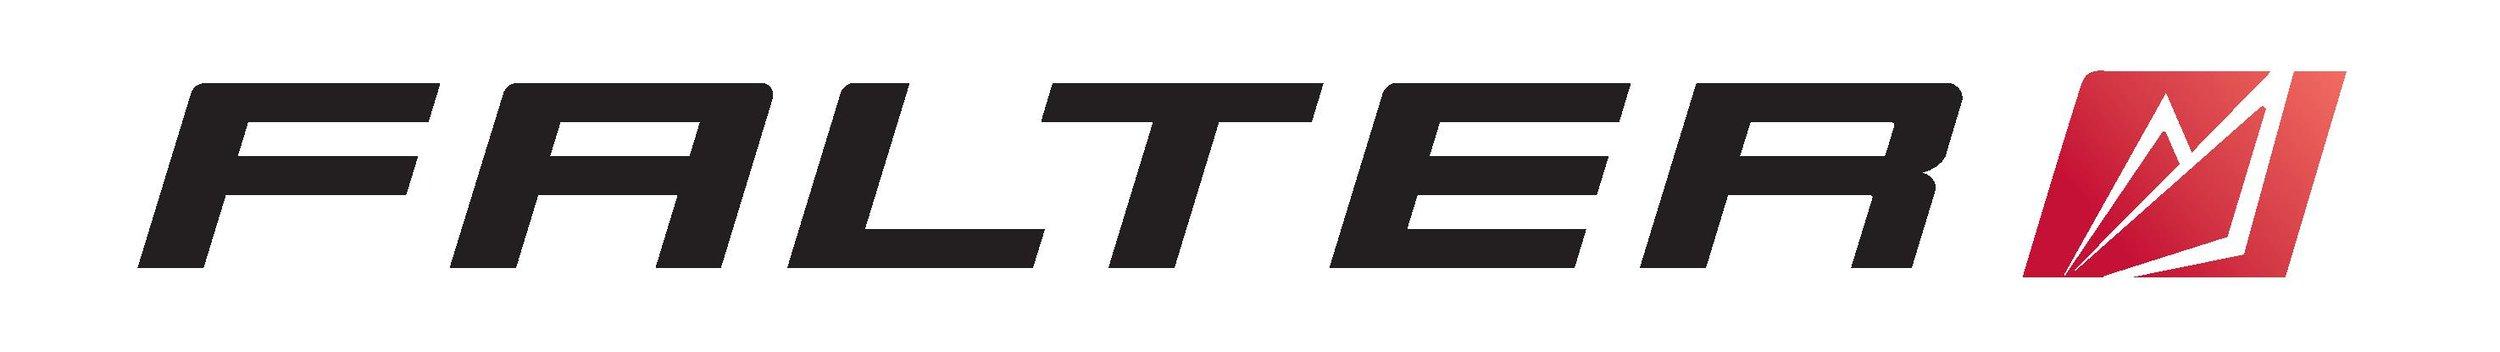 Falter_logo.jpg